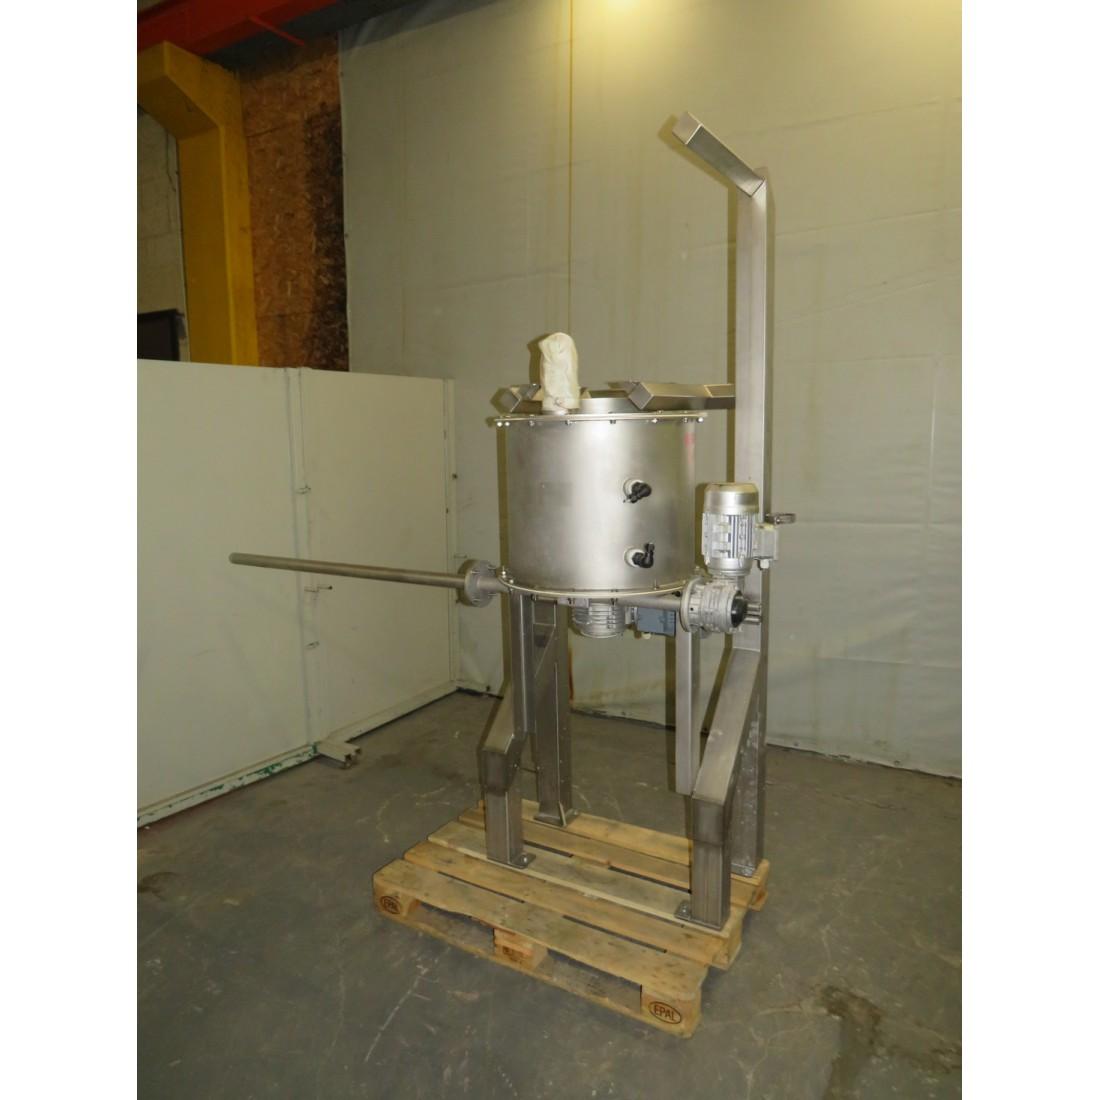 R6VB850 Stainless steel screw feeder